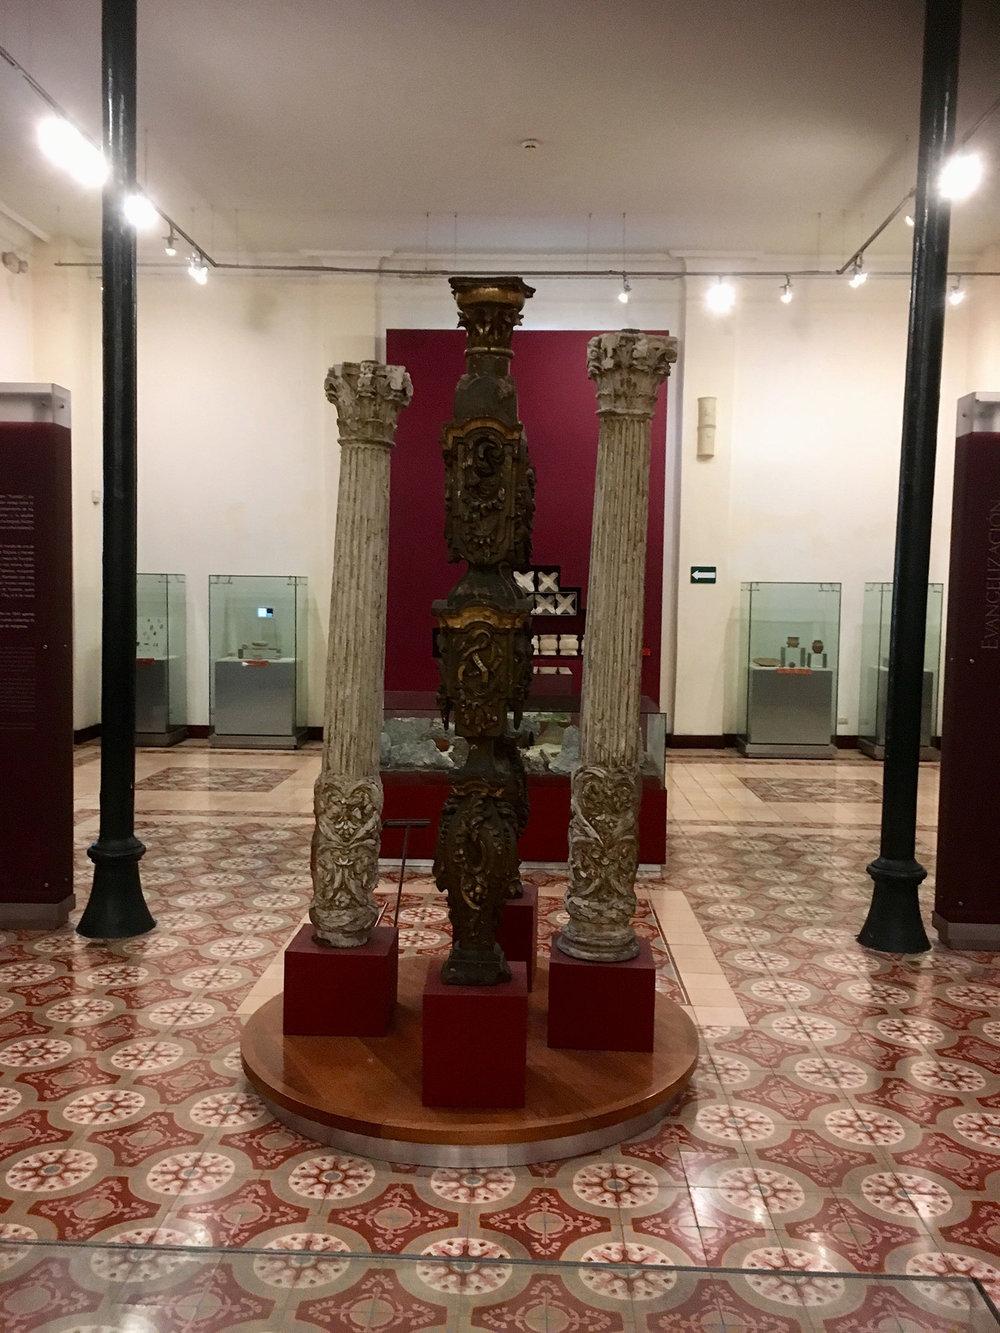 Hammocks_and_Ruins_Blog_Riviera_Maya_Mexico_Travel_Discover_Yucatan_What_to_do_Museums_Merida_City_Museum_20.jpg